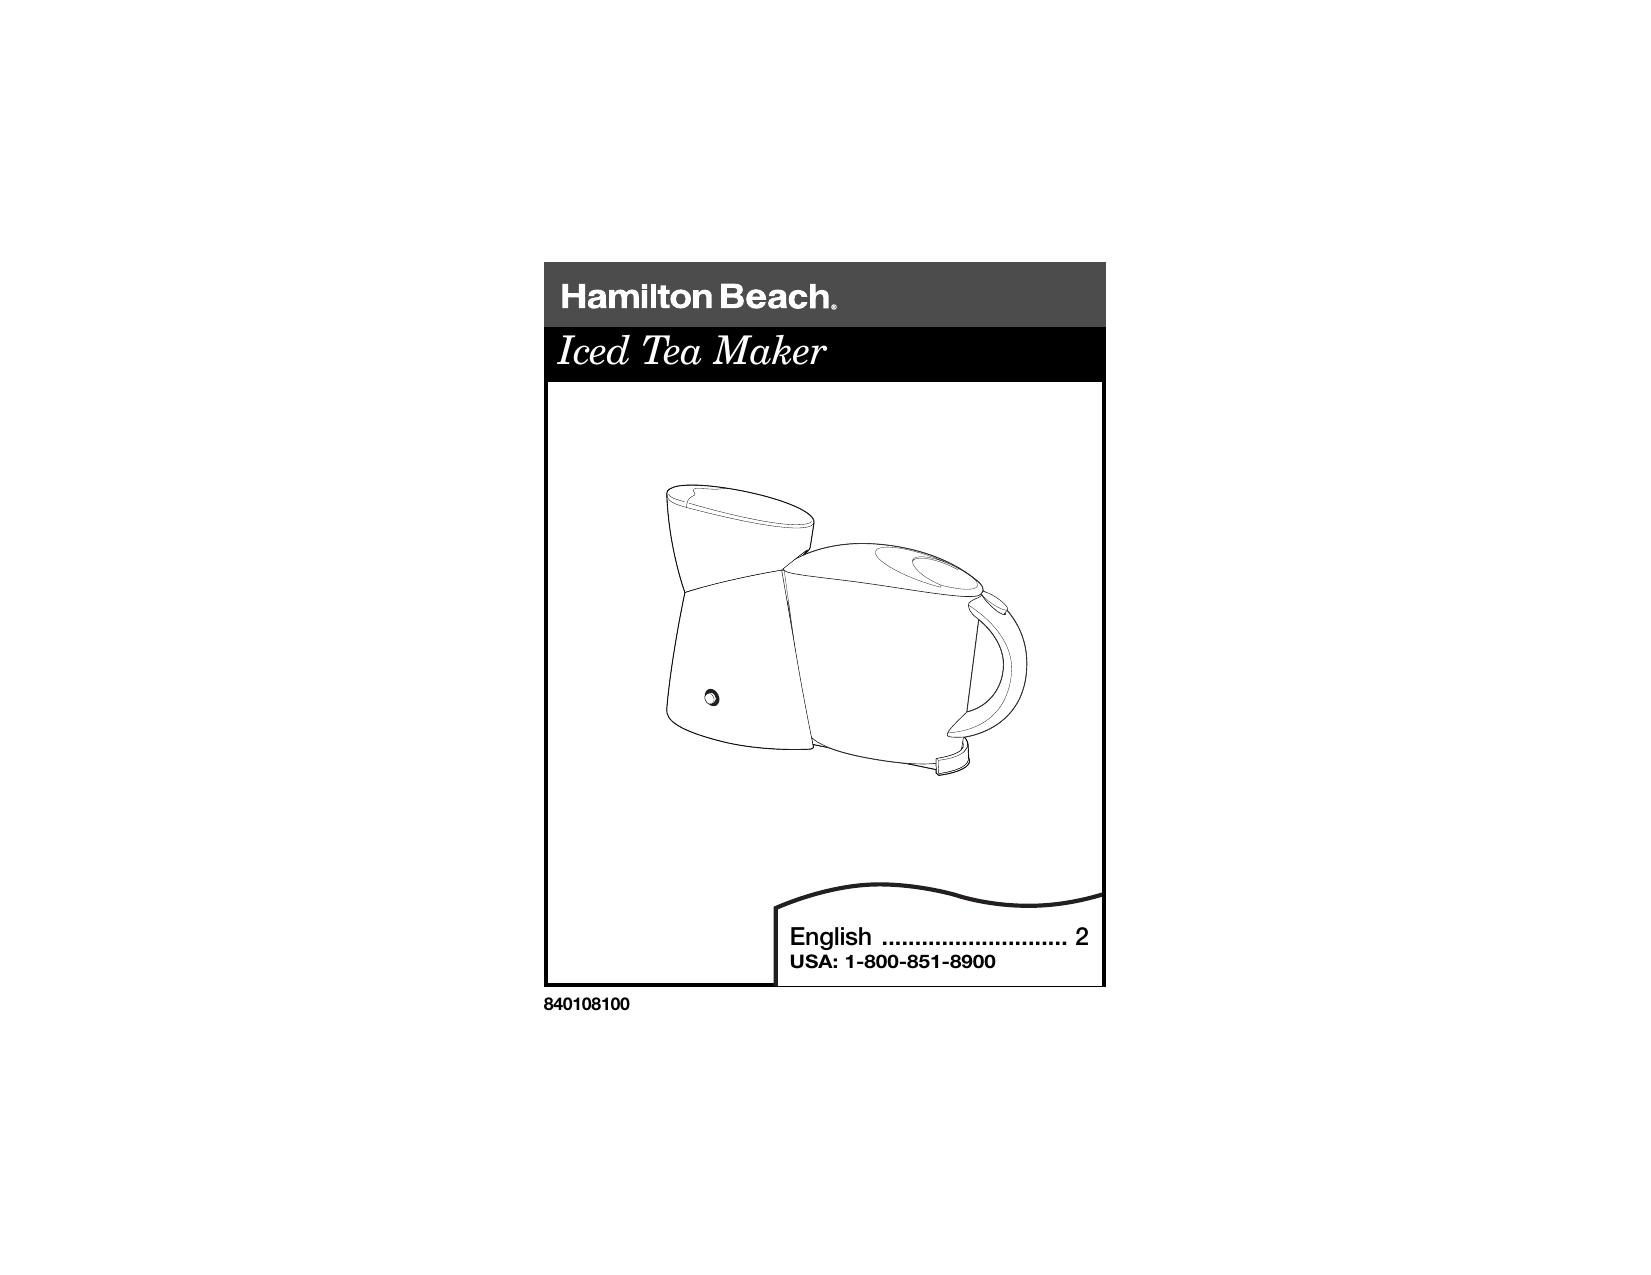 Hamilton Beach Ice Tea Maker Iced Tea Maker User manual